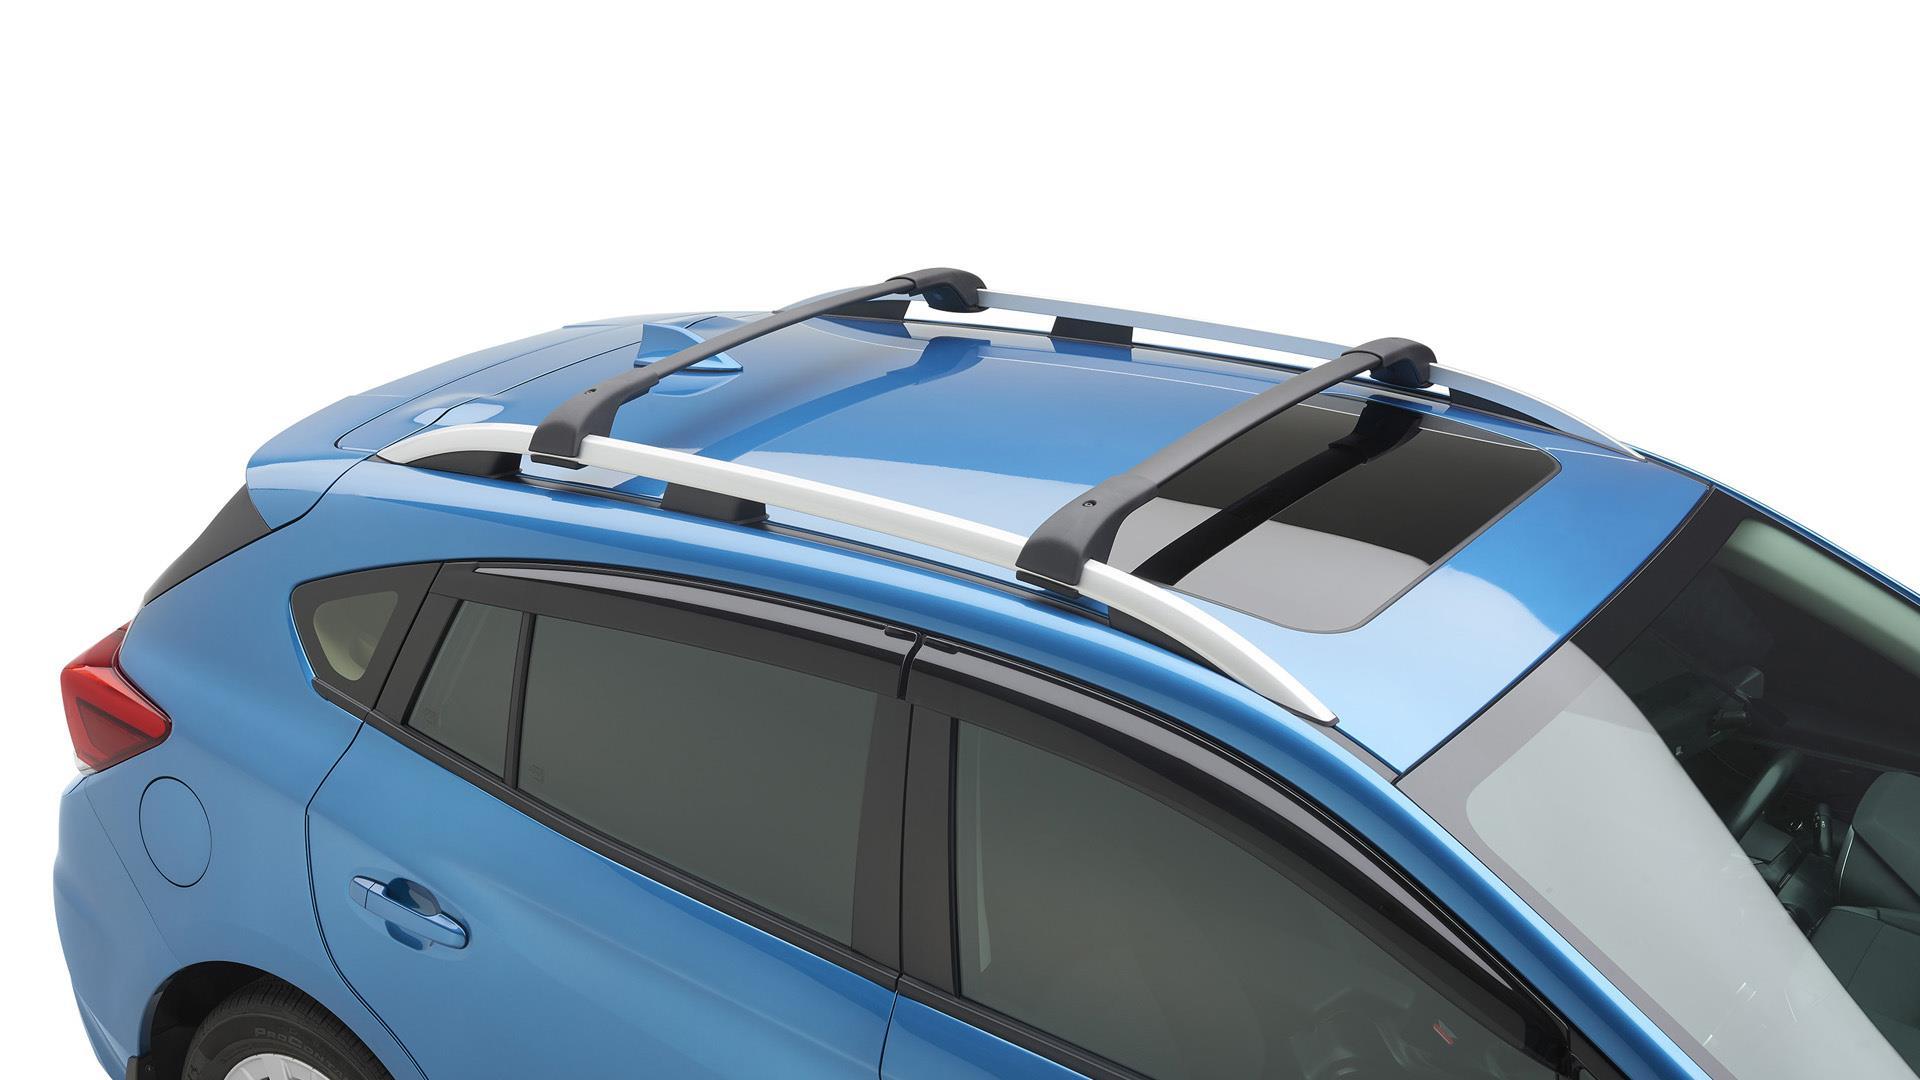 Shop Genuine 2017 Subaru Impreza Accessories From Rafferty